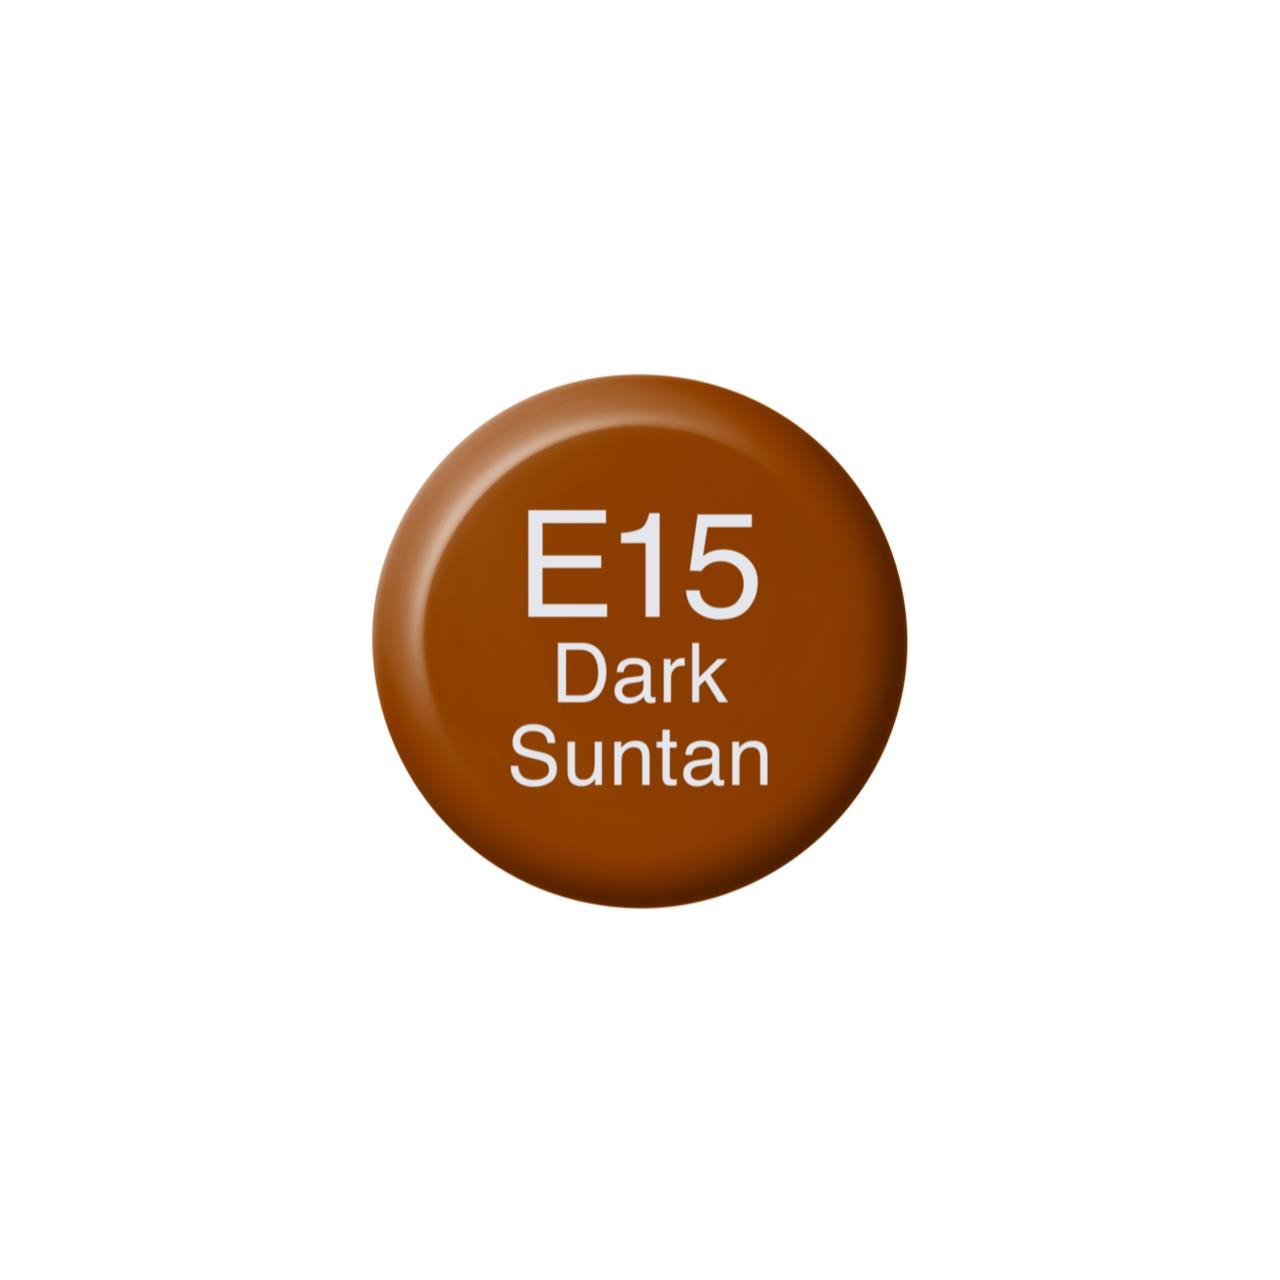 E15 Dark Suntan, Copic Ink - 4511338056691